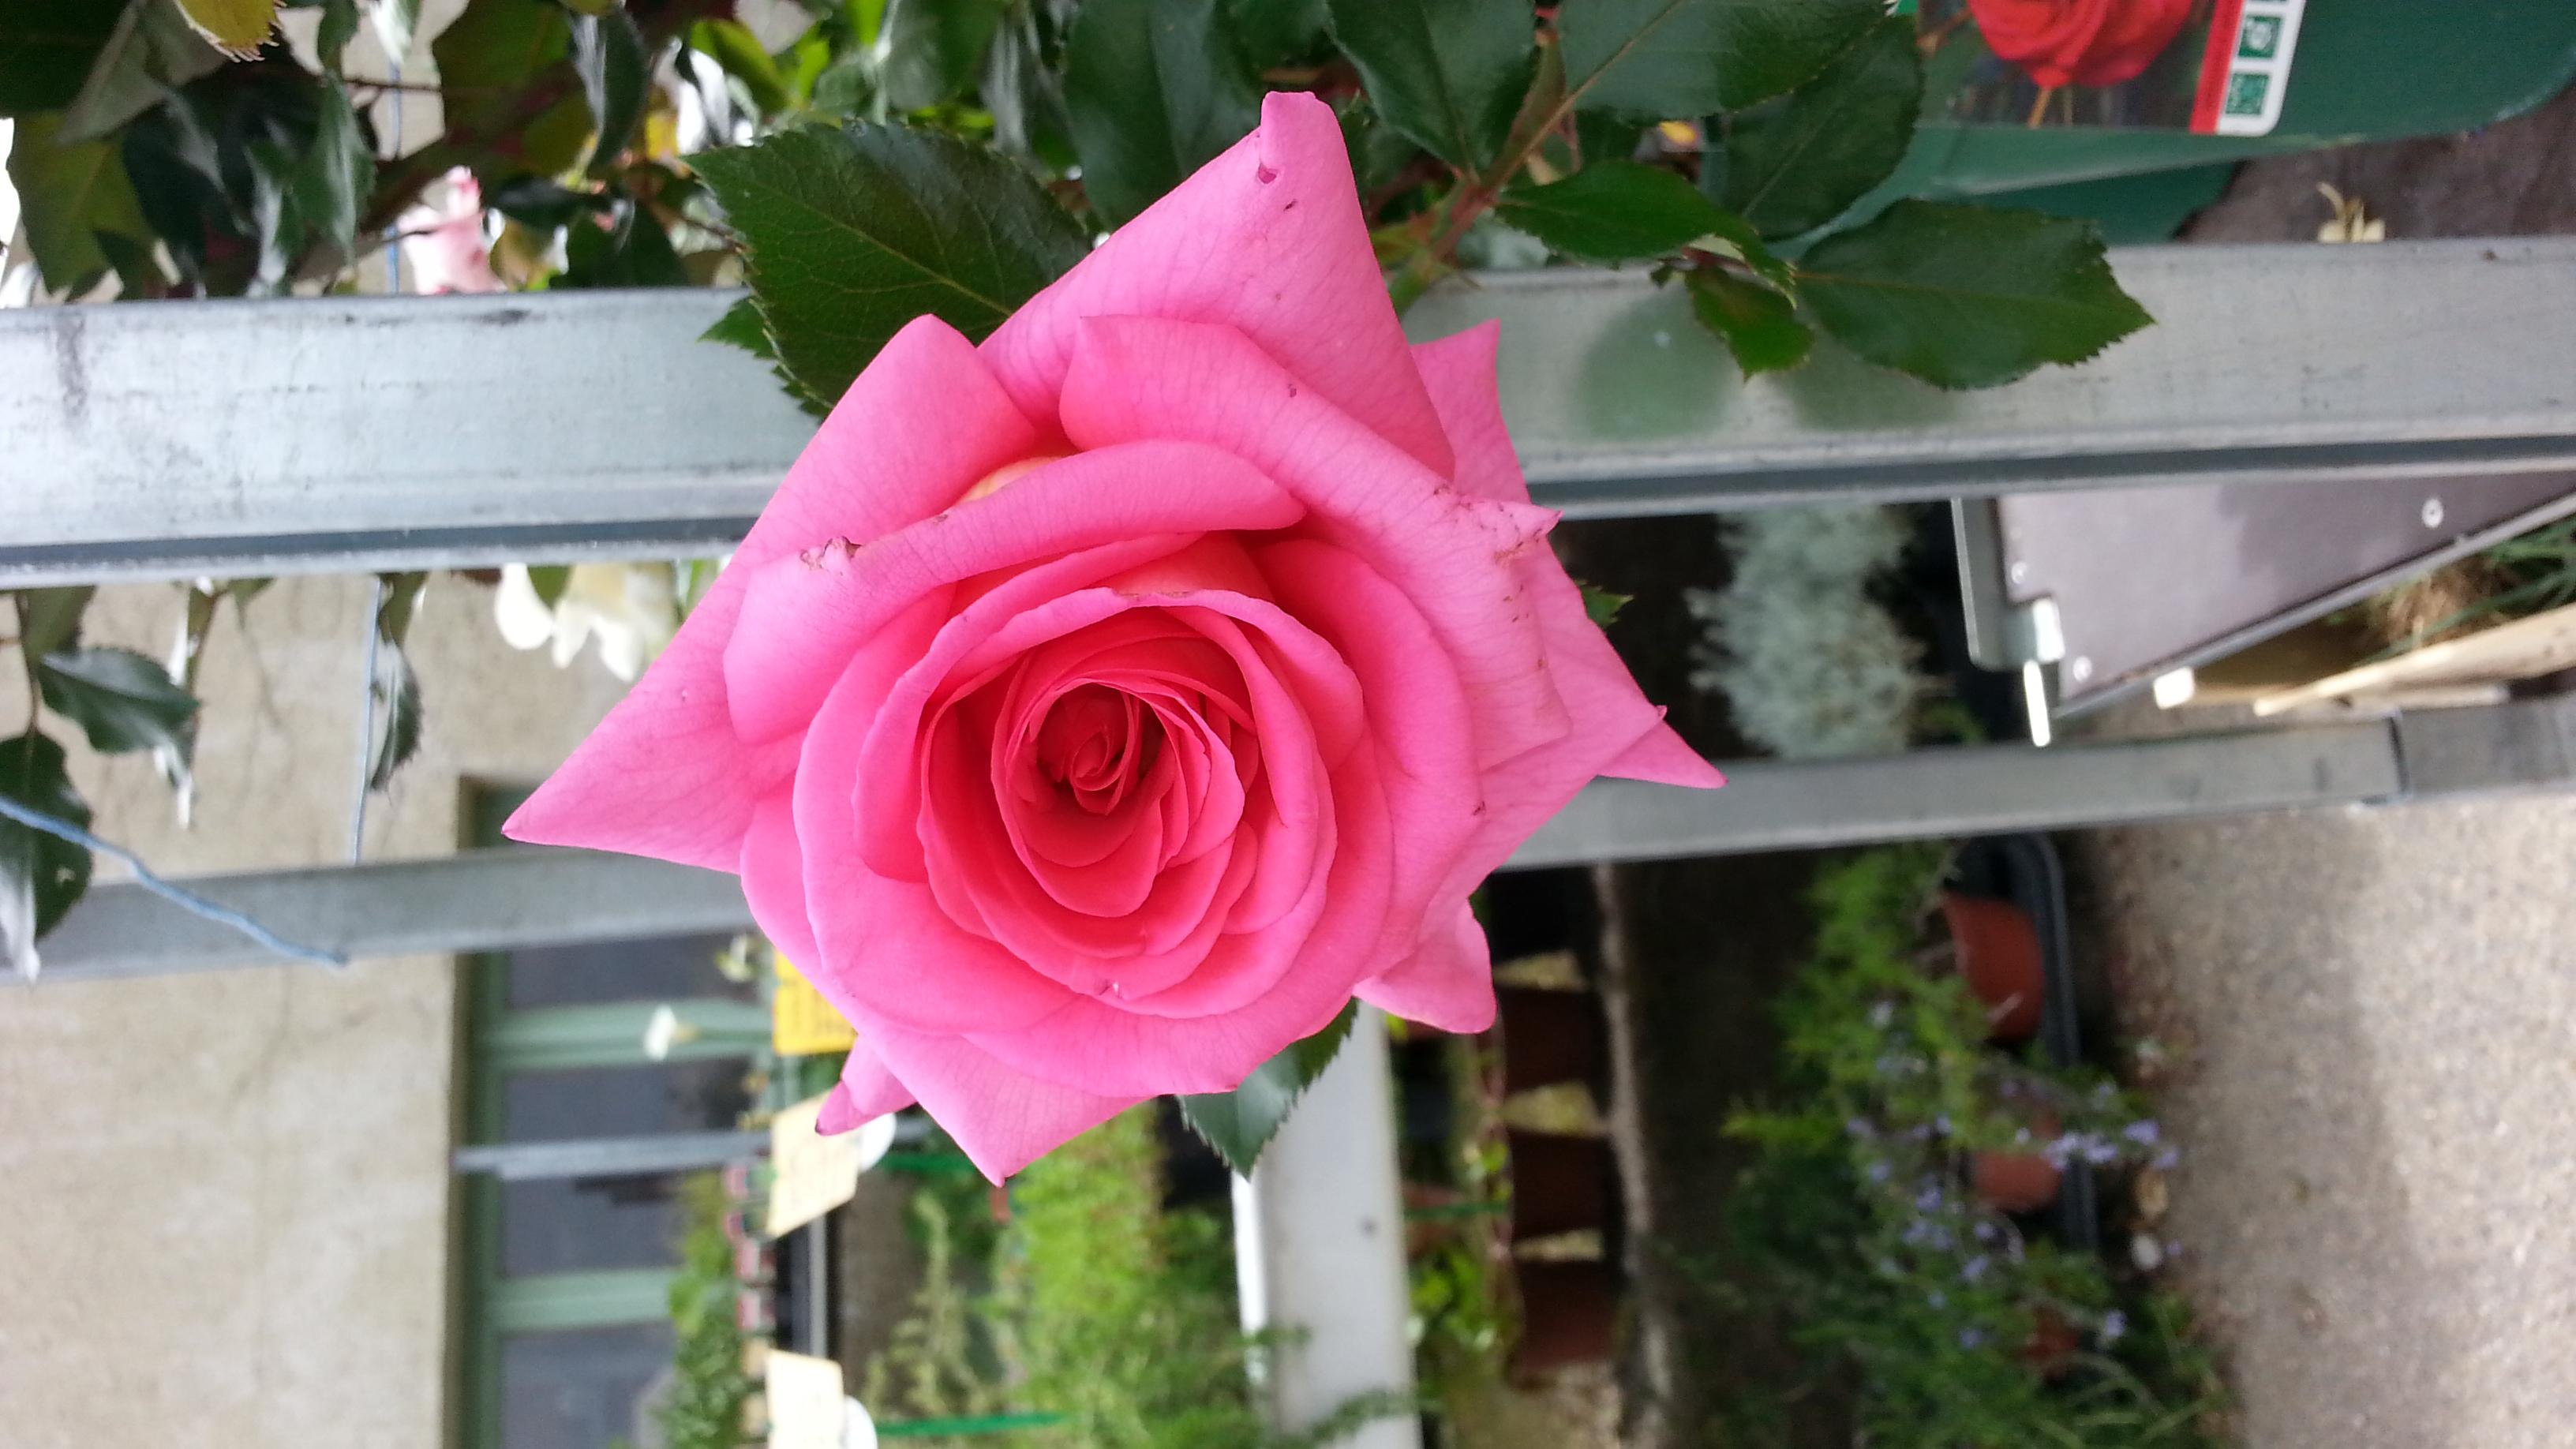 rosier jardinerie p pini re 31270 villeneuve tolosane. Black Bedroom Furniture Sets. Home Design Ideas